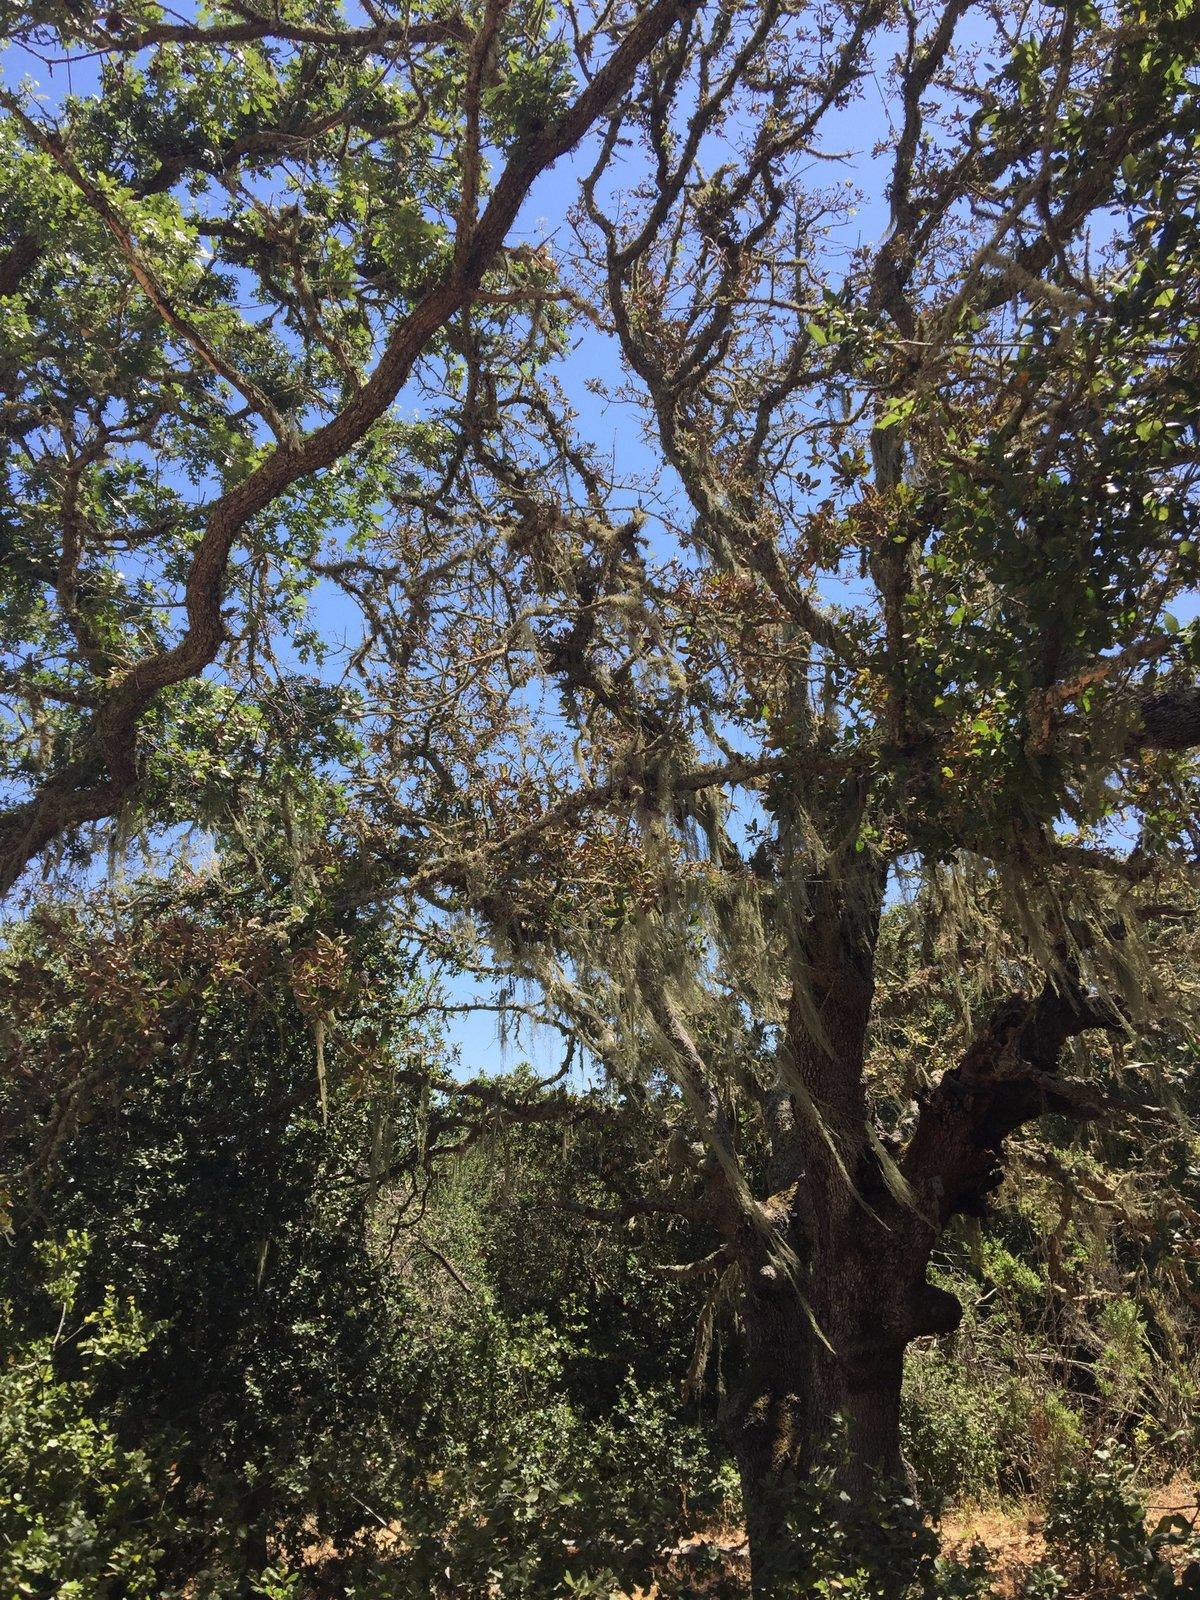 Mossy oak trees.  Photo 7 of 7 in Arastradero Preserve